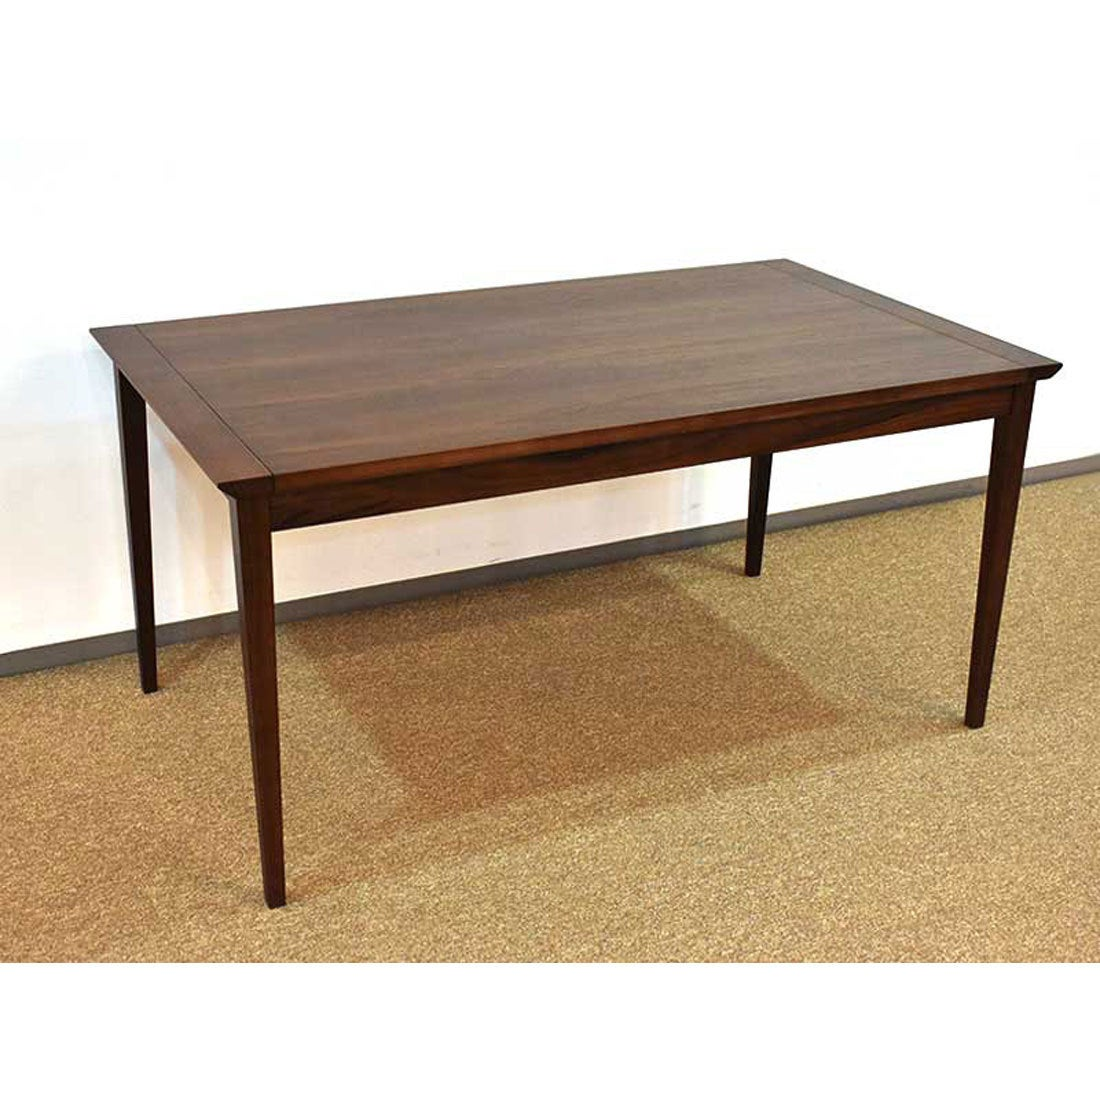 IDC OTSUKA/大塚家具 テーブル(伸長式) OT LL WN (ウォールナット)